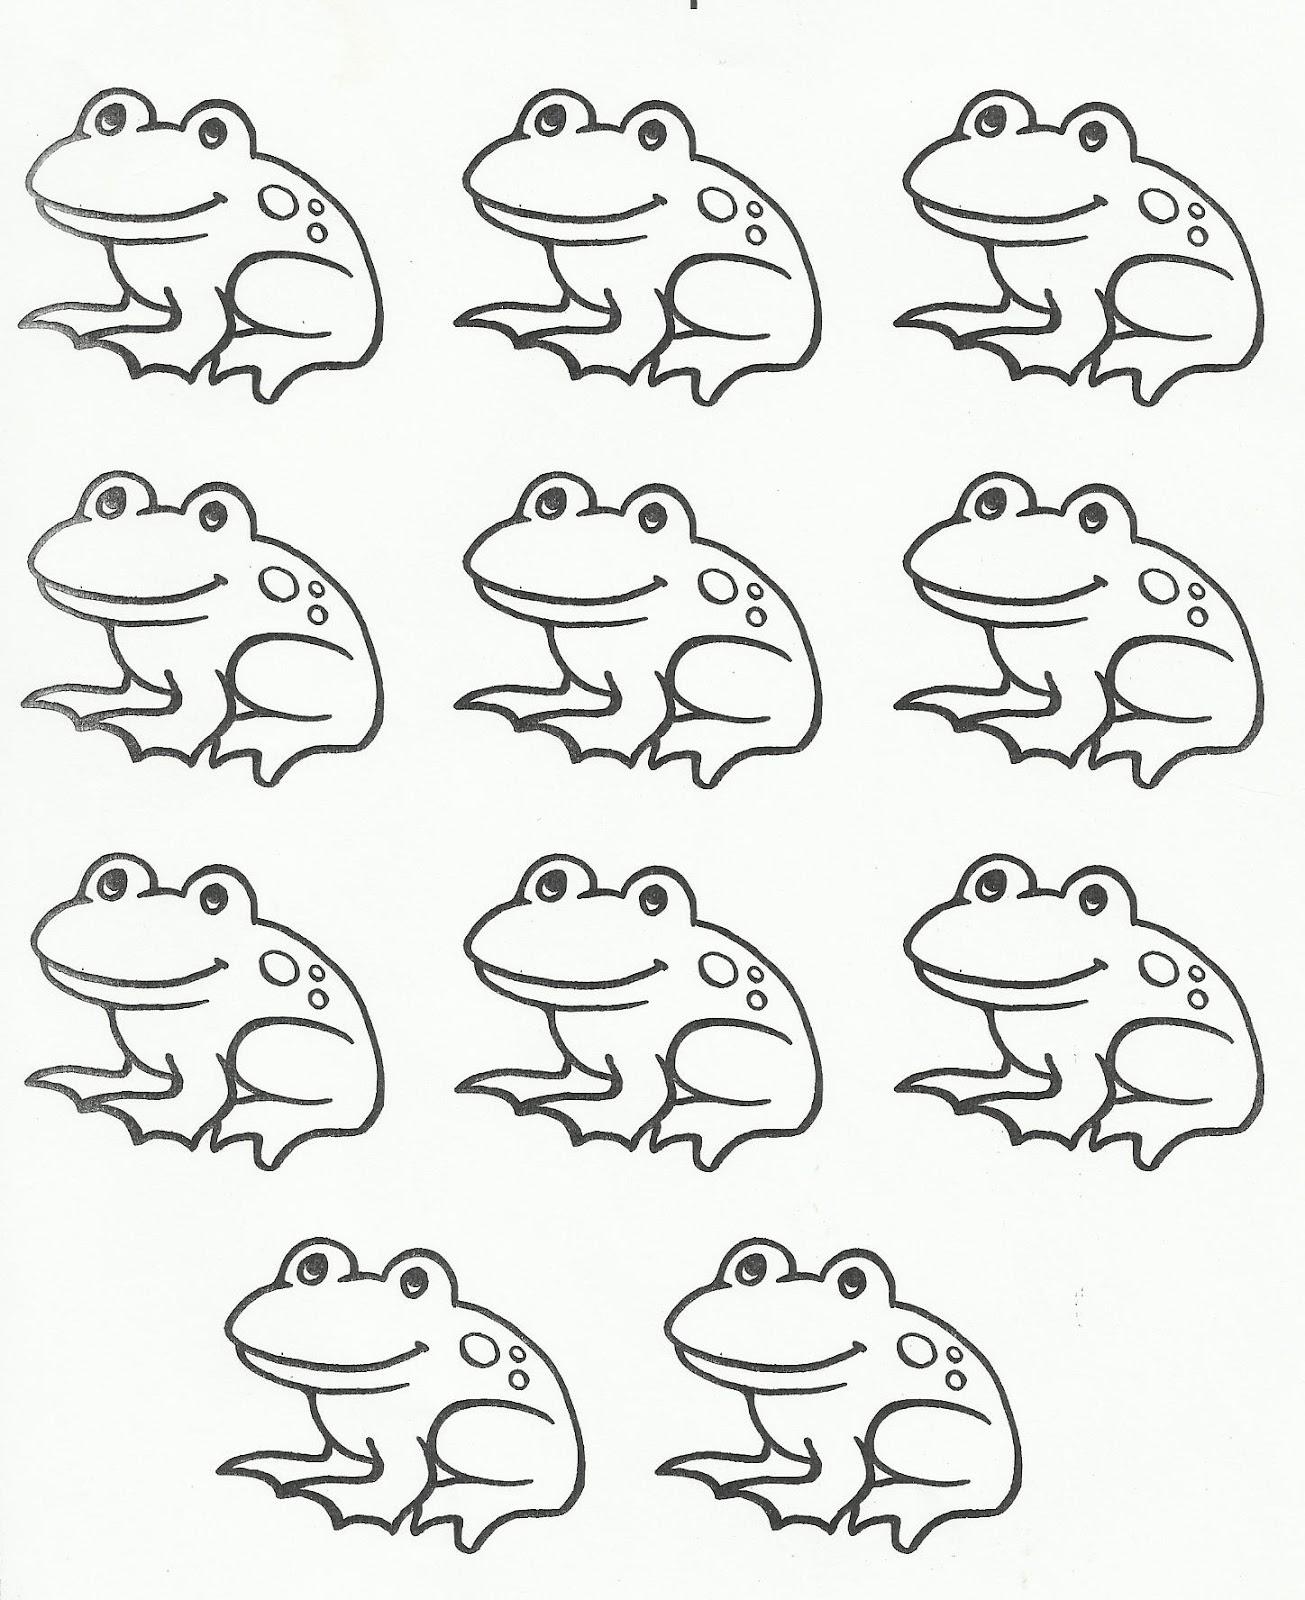 Squish Preschool Ideas: Tadpole To Frog